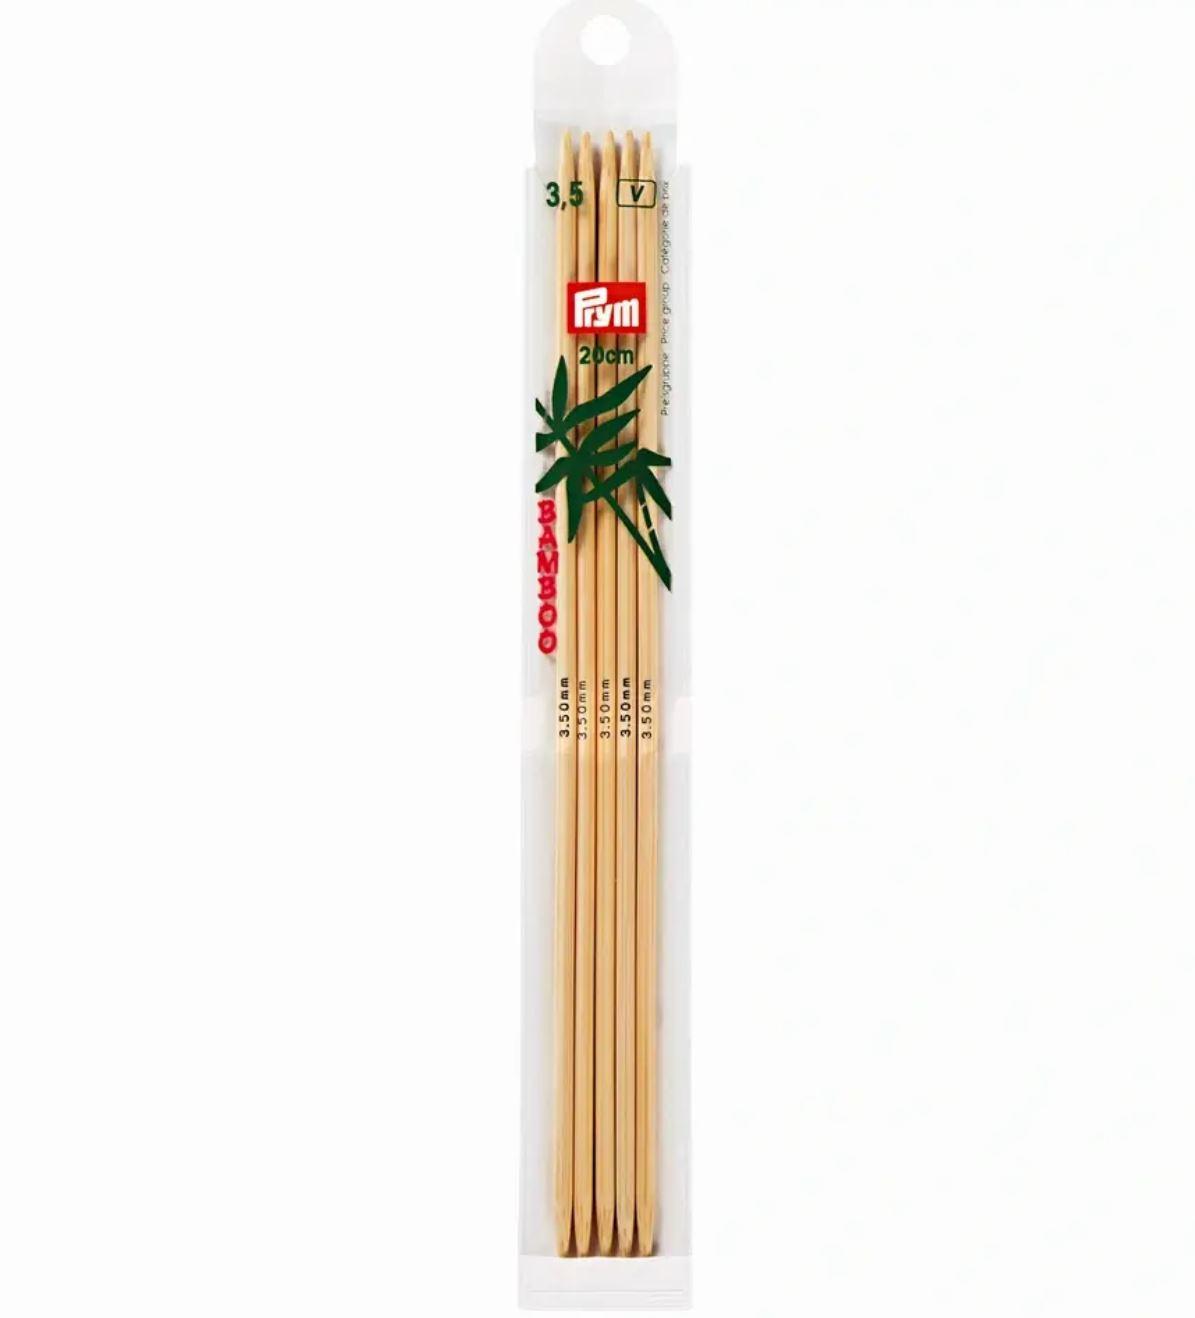 Prym Bamboo Settpinne 5stk - Bambus - 3,5 - 20cm